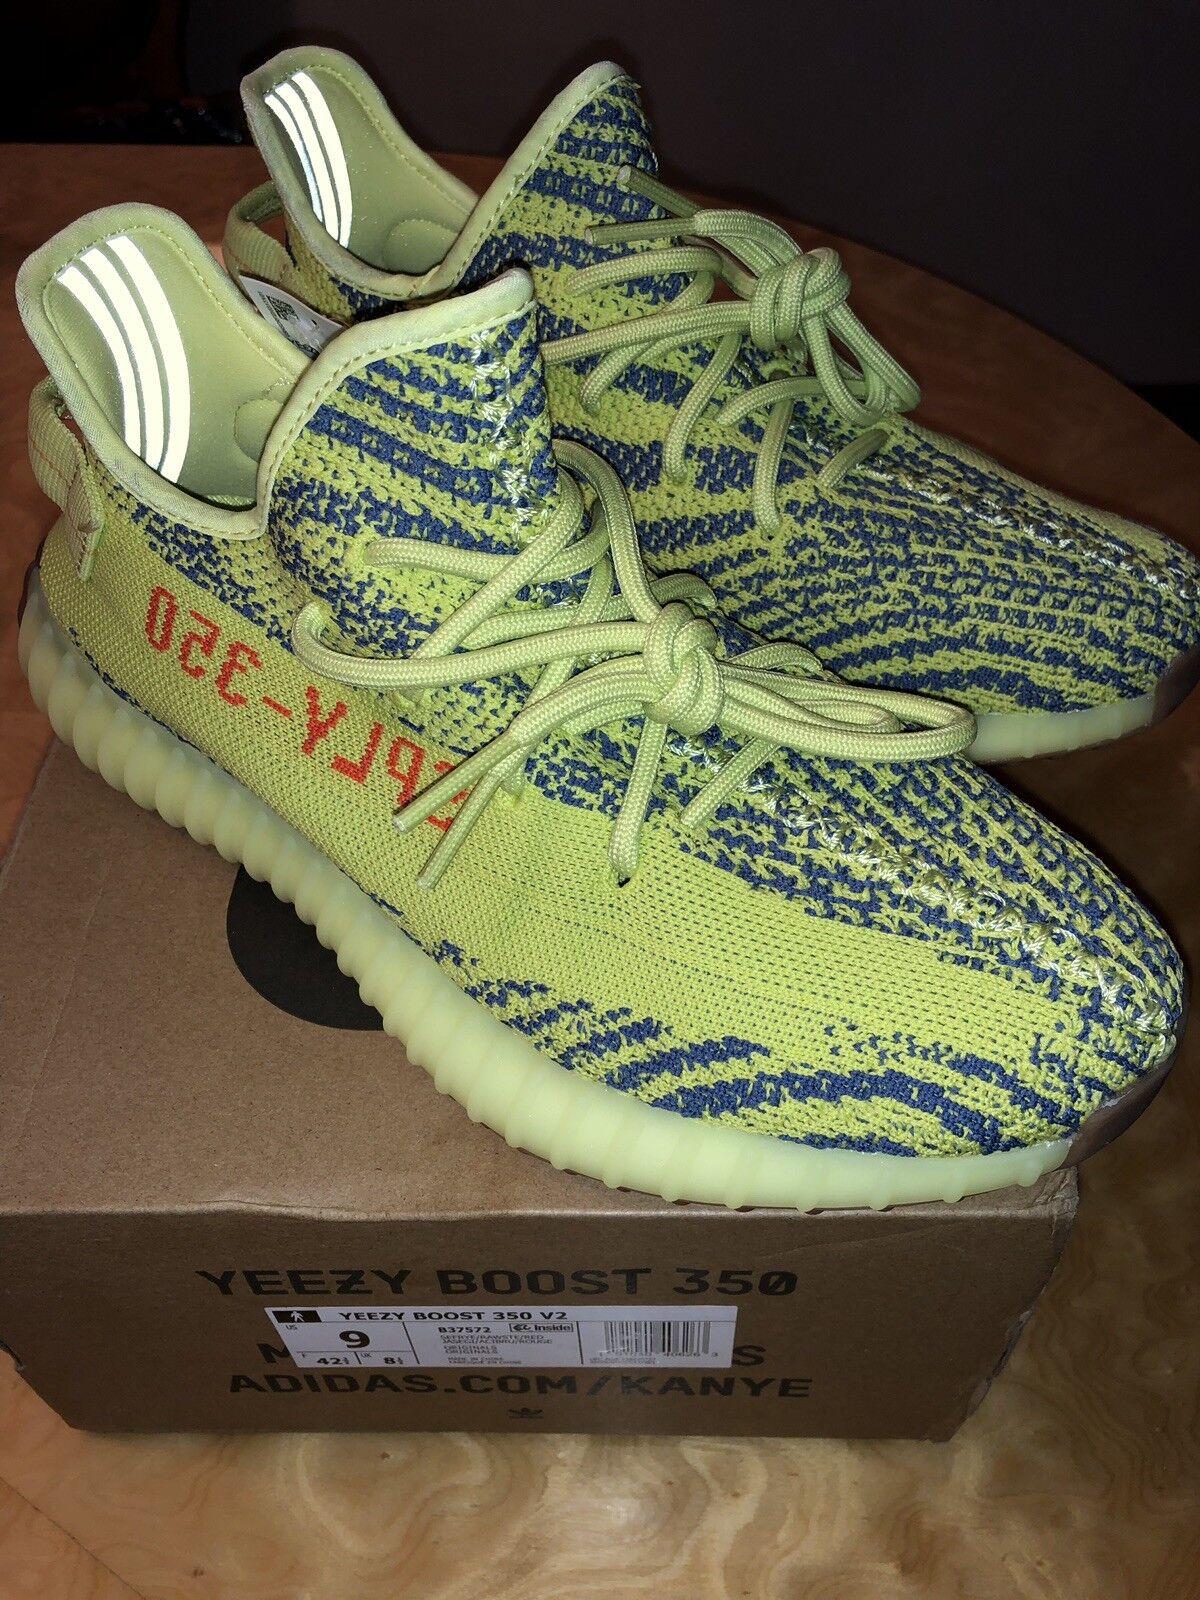 Adidas Yeezy Boost 350 V2 Frozen Yellow Semi Frozen B37572 Authentic